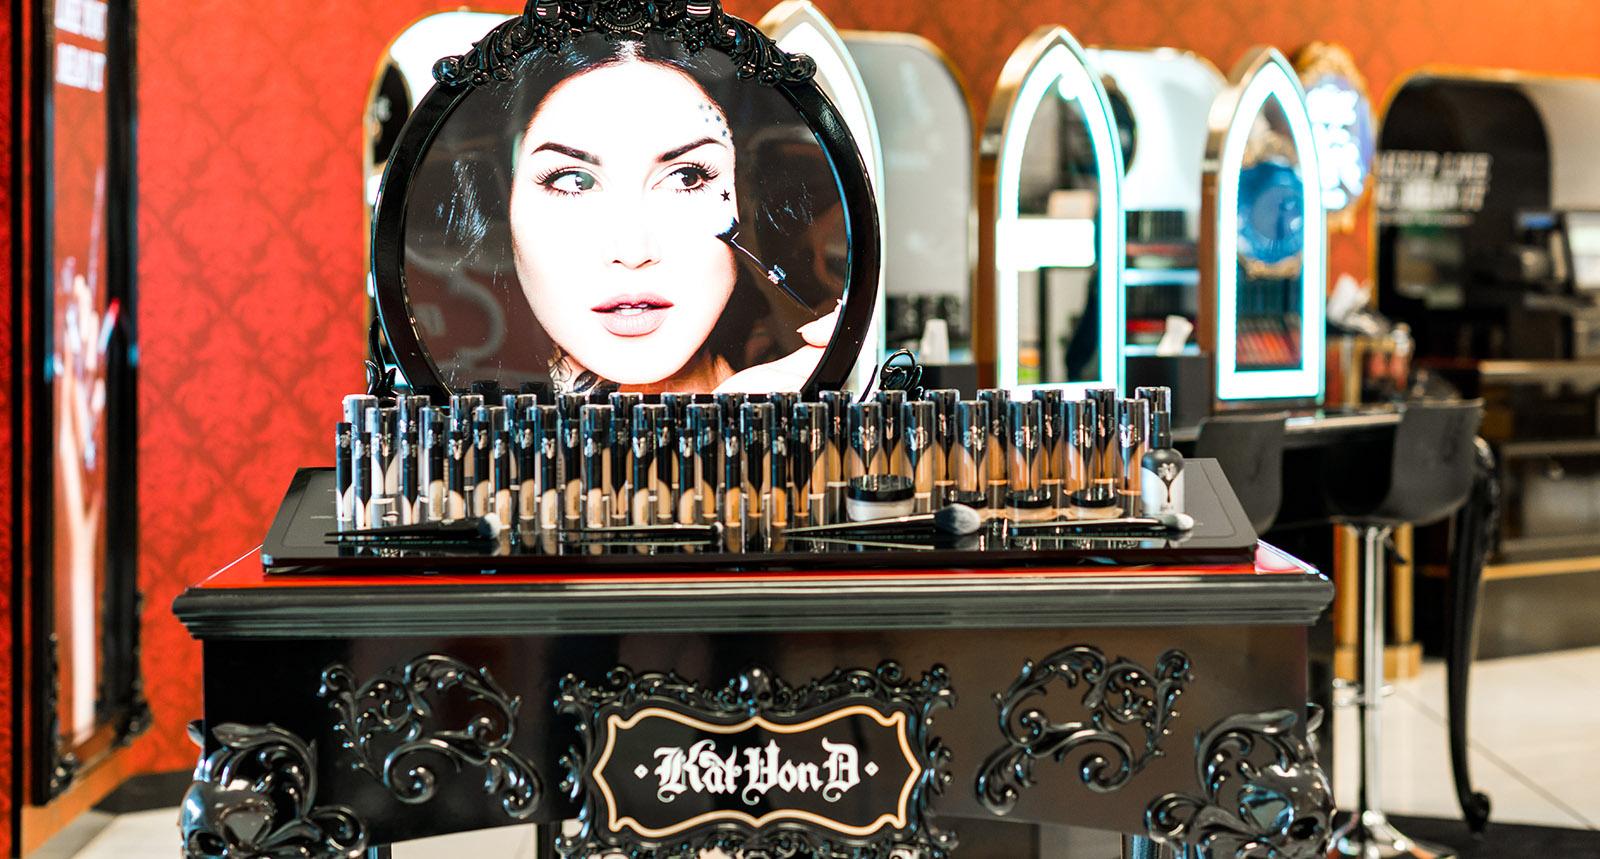 Makeup table with photo of Kat von D